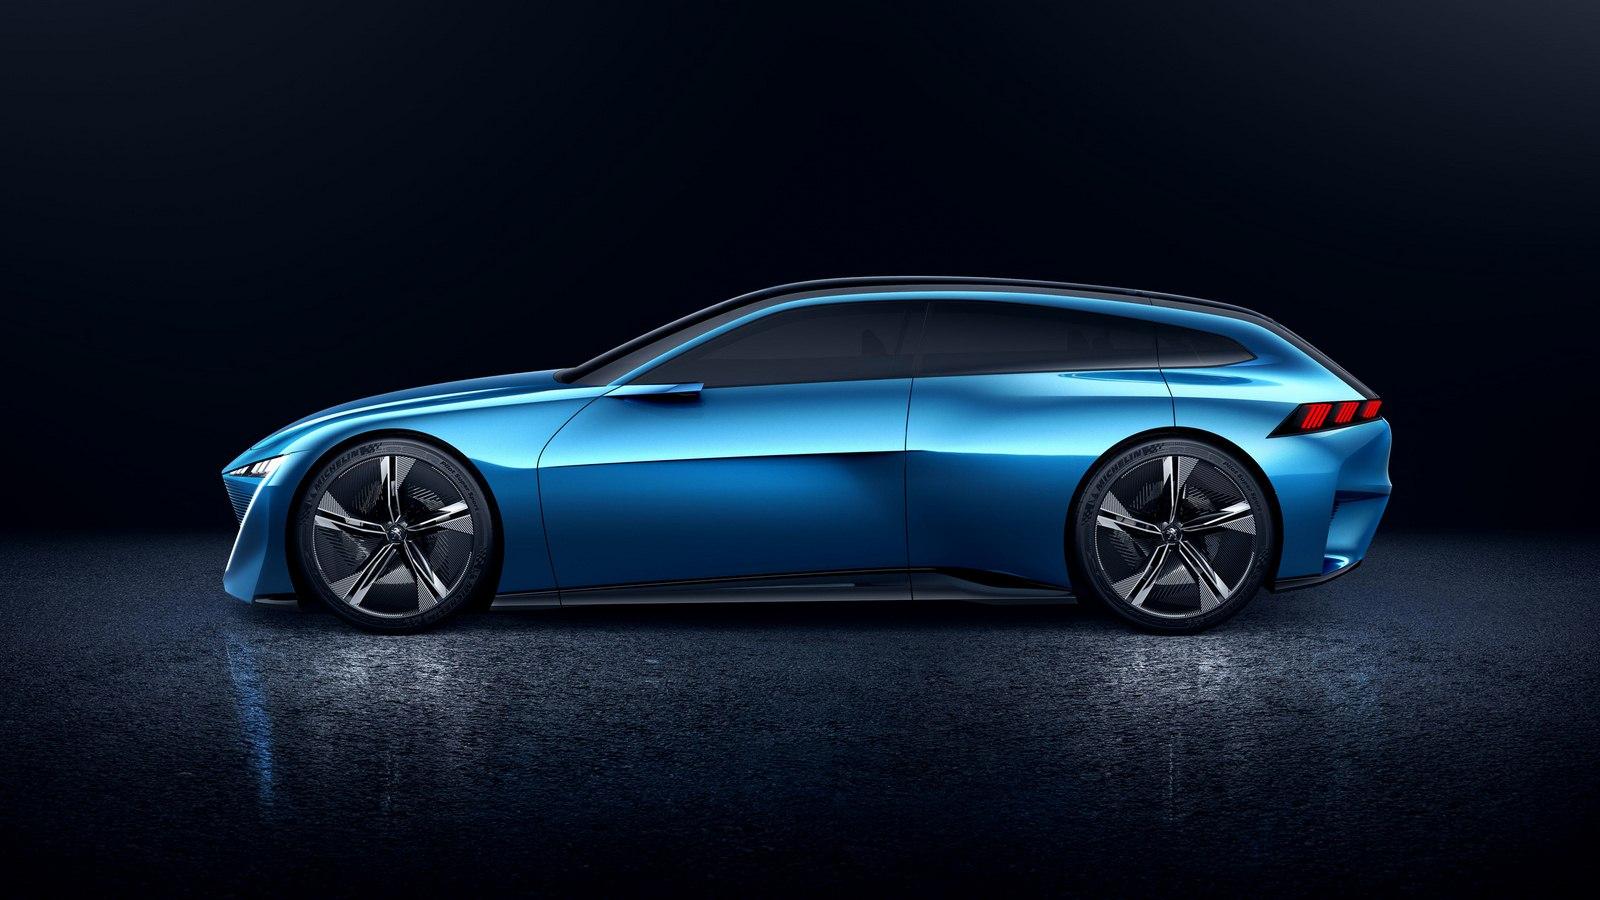 2017-Peugeot-Instinct-Concept-02